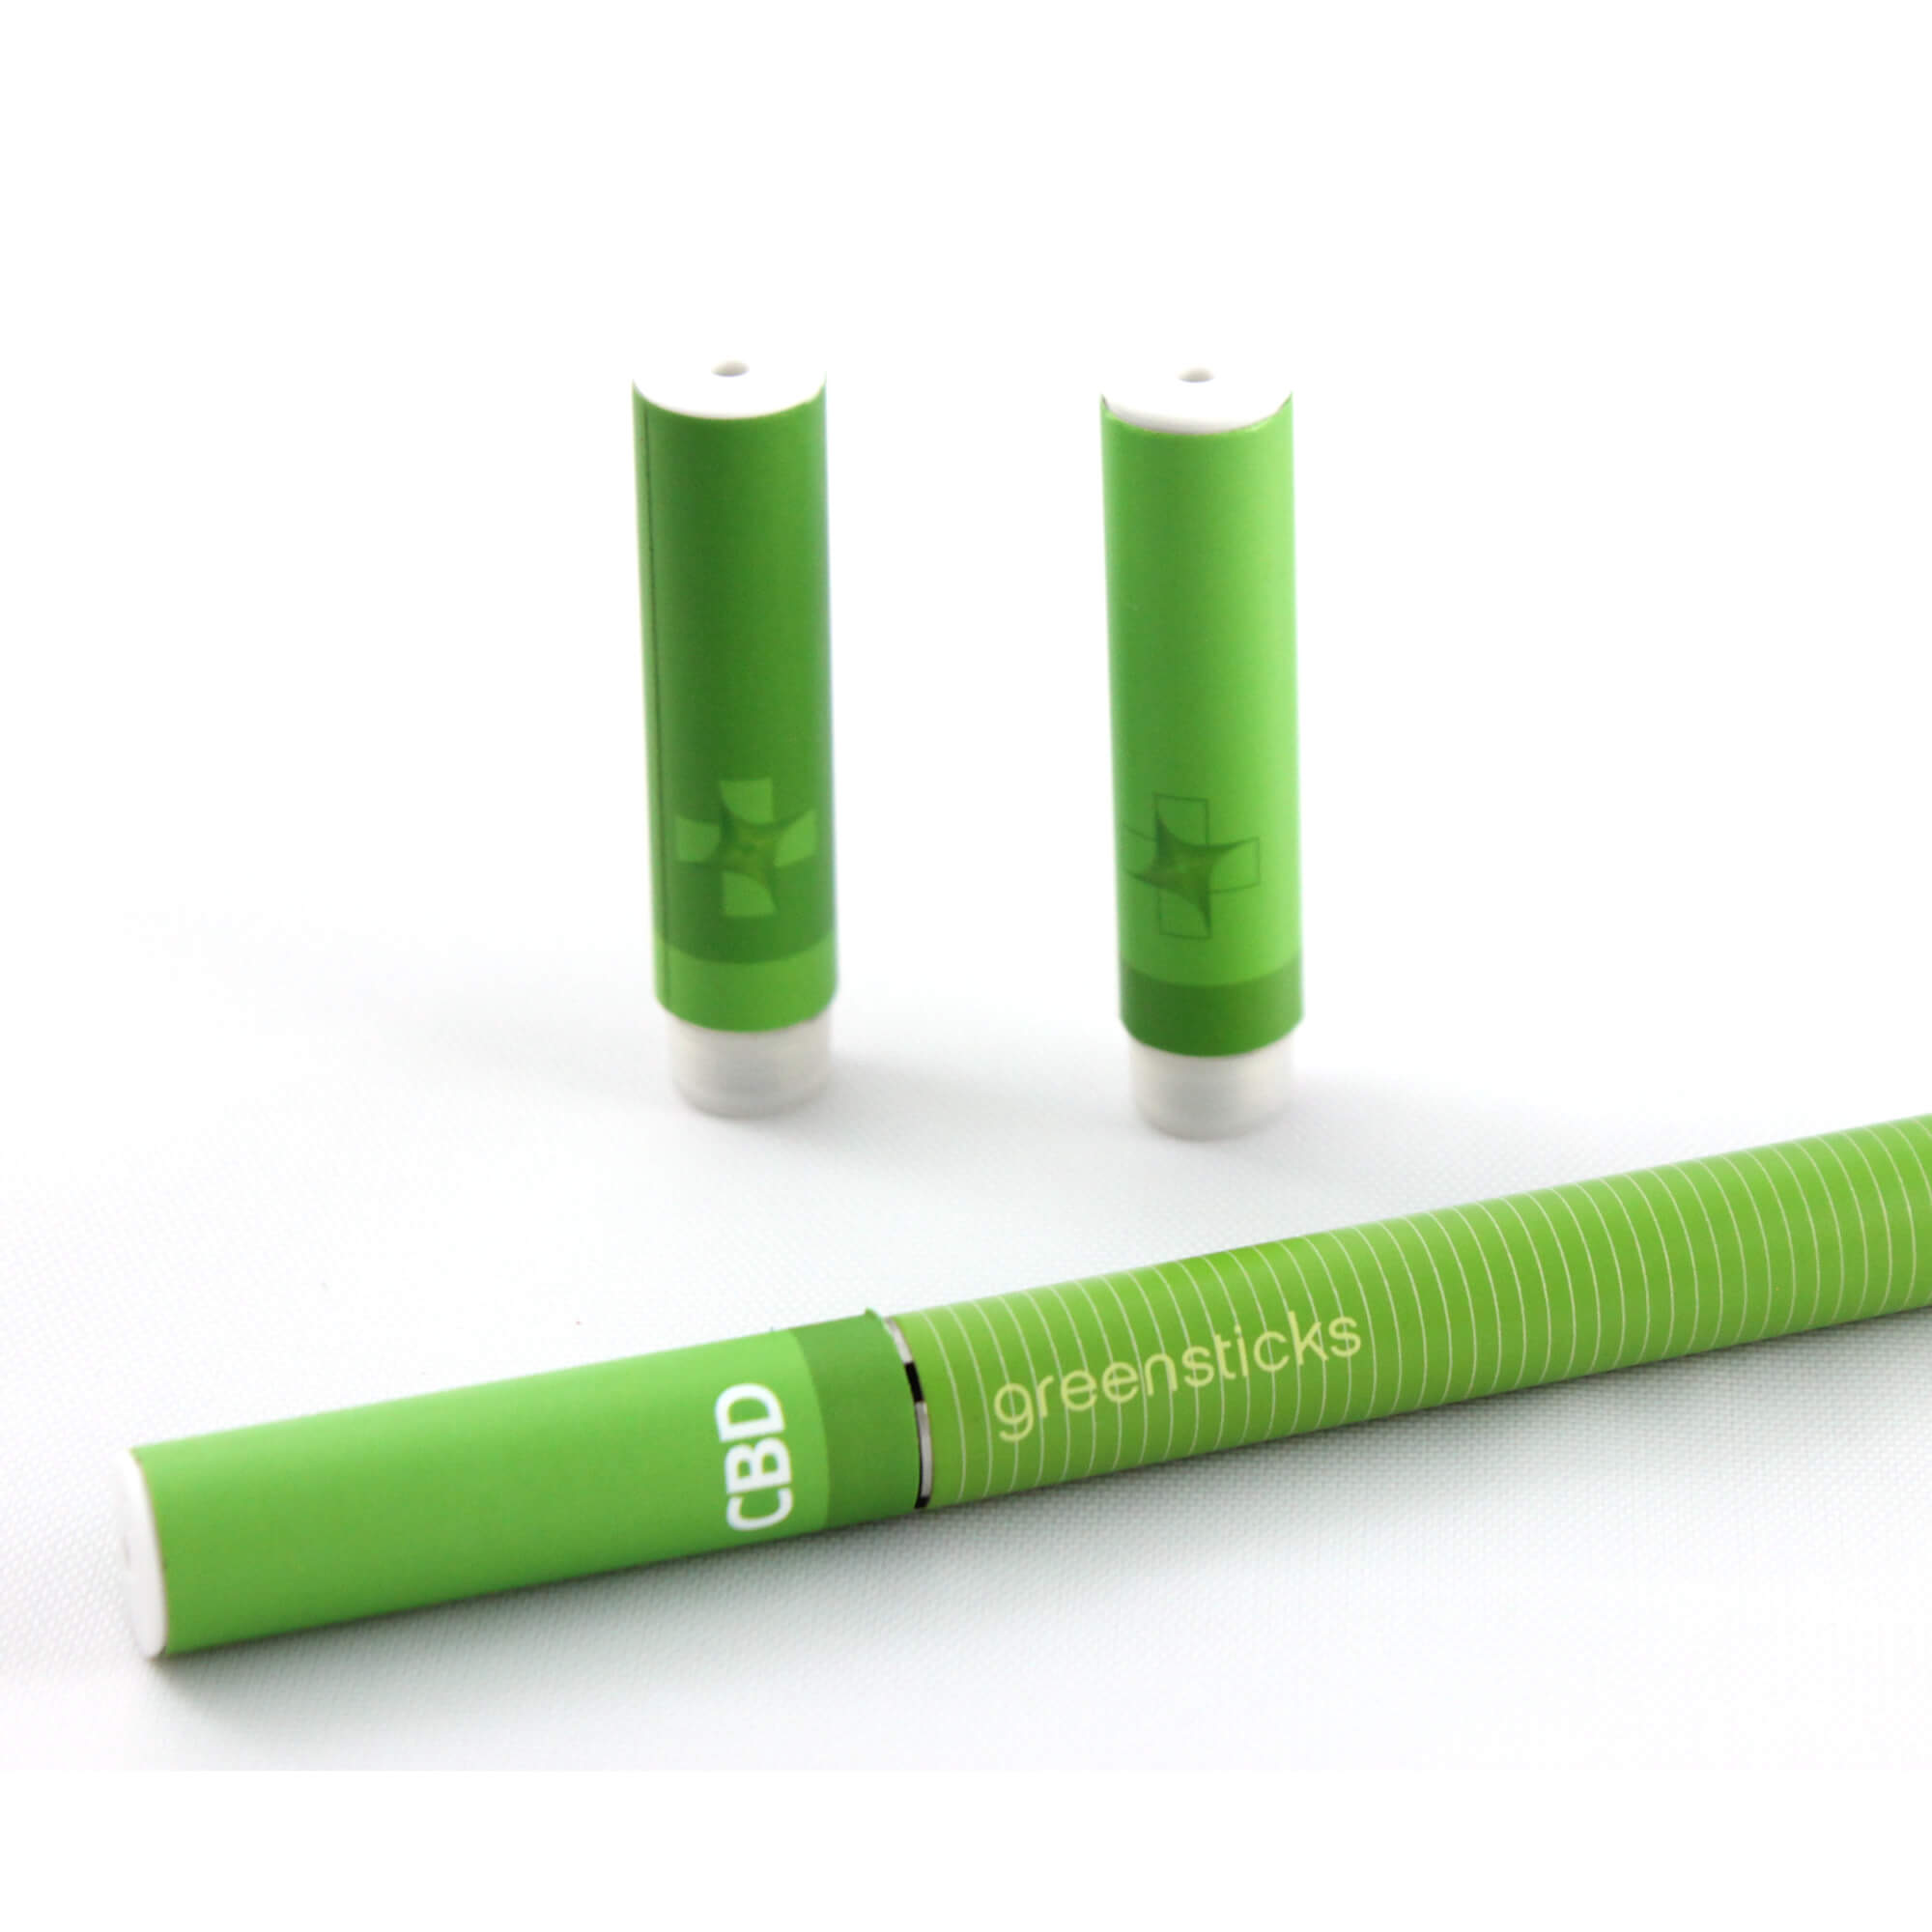 Whole Flower Fluid CBD Vaporizer Cartridge and Pen